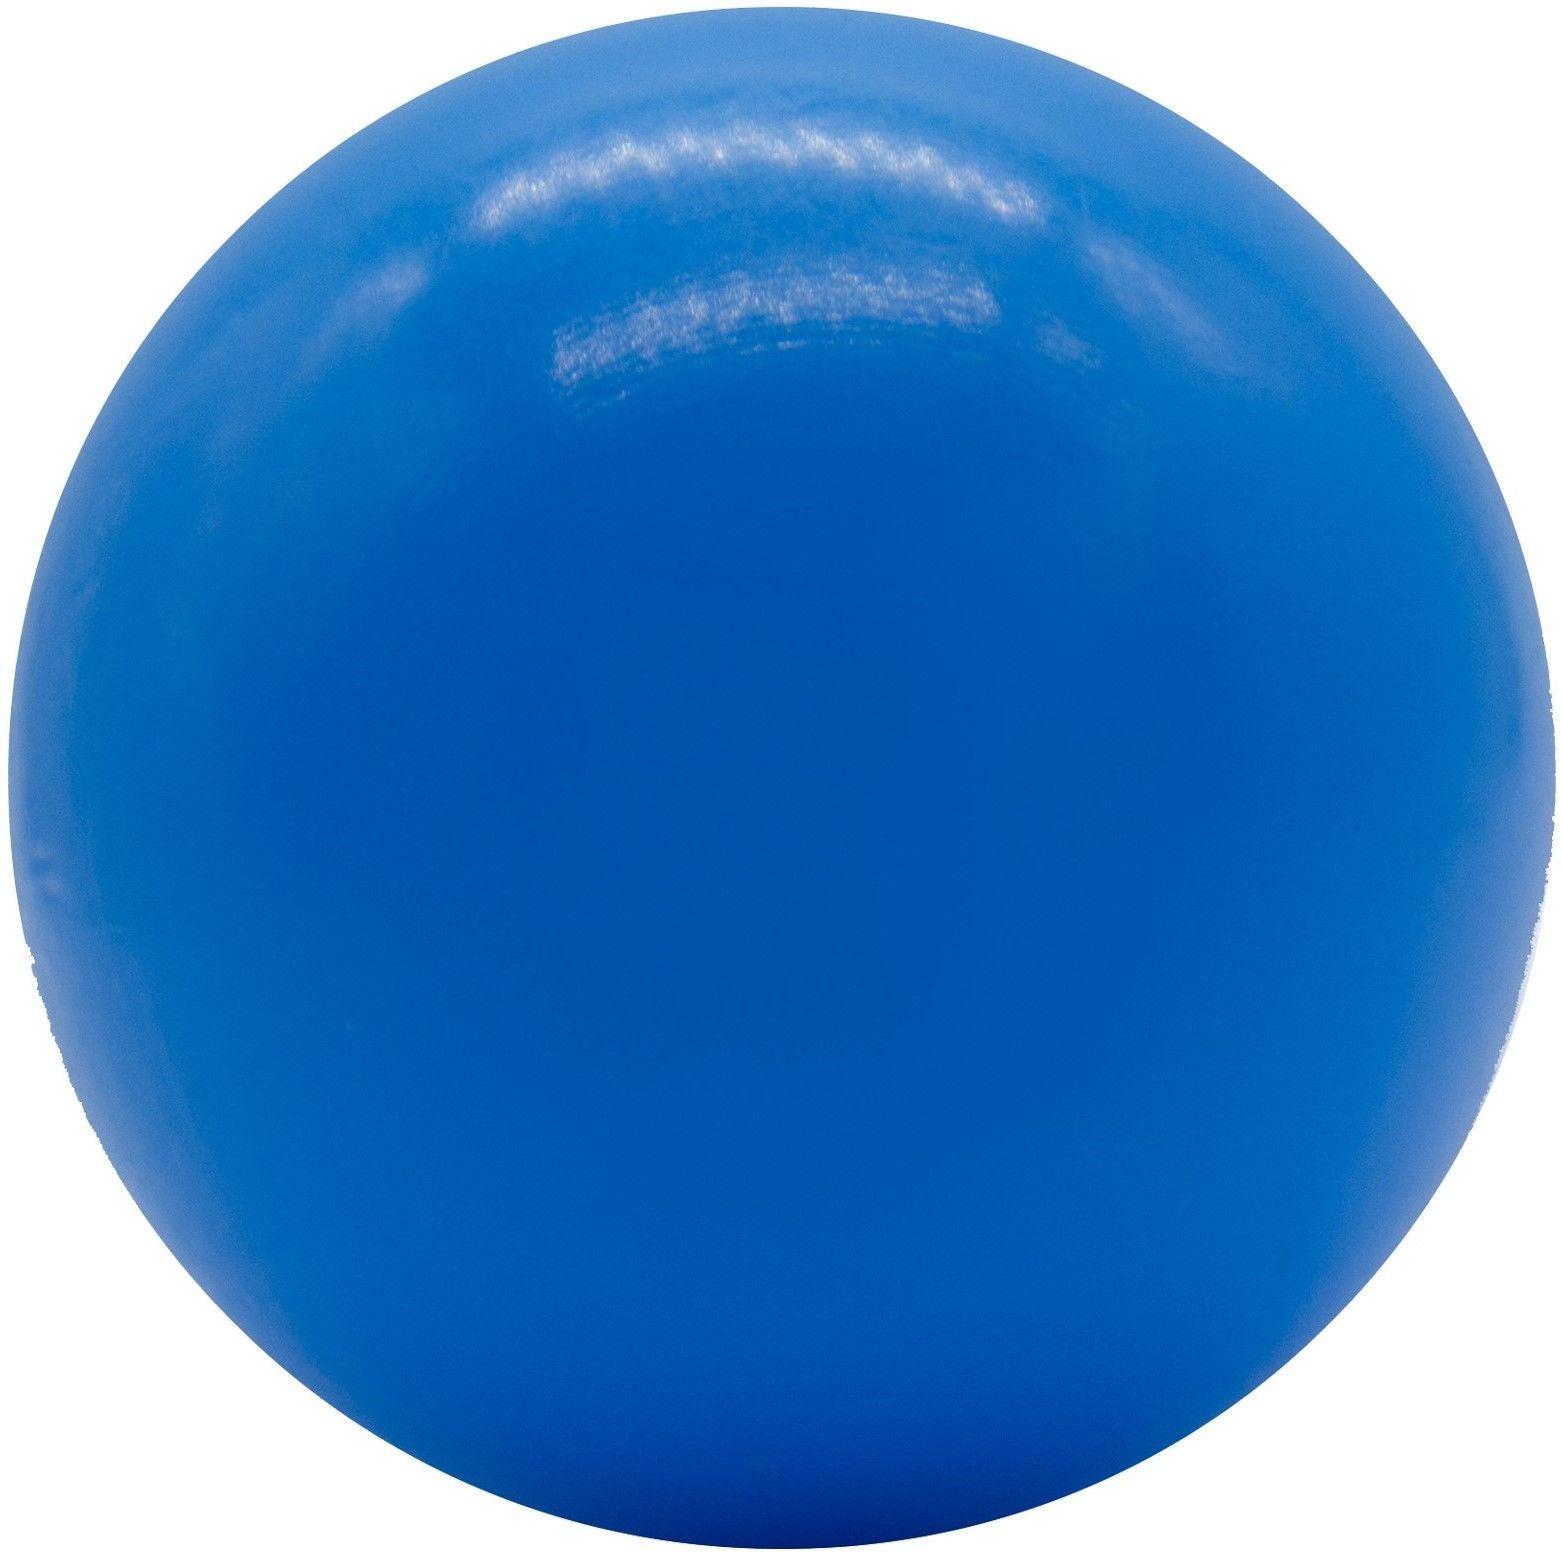 KIDKII Extra Bollar 50 st, Light Blue